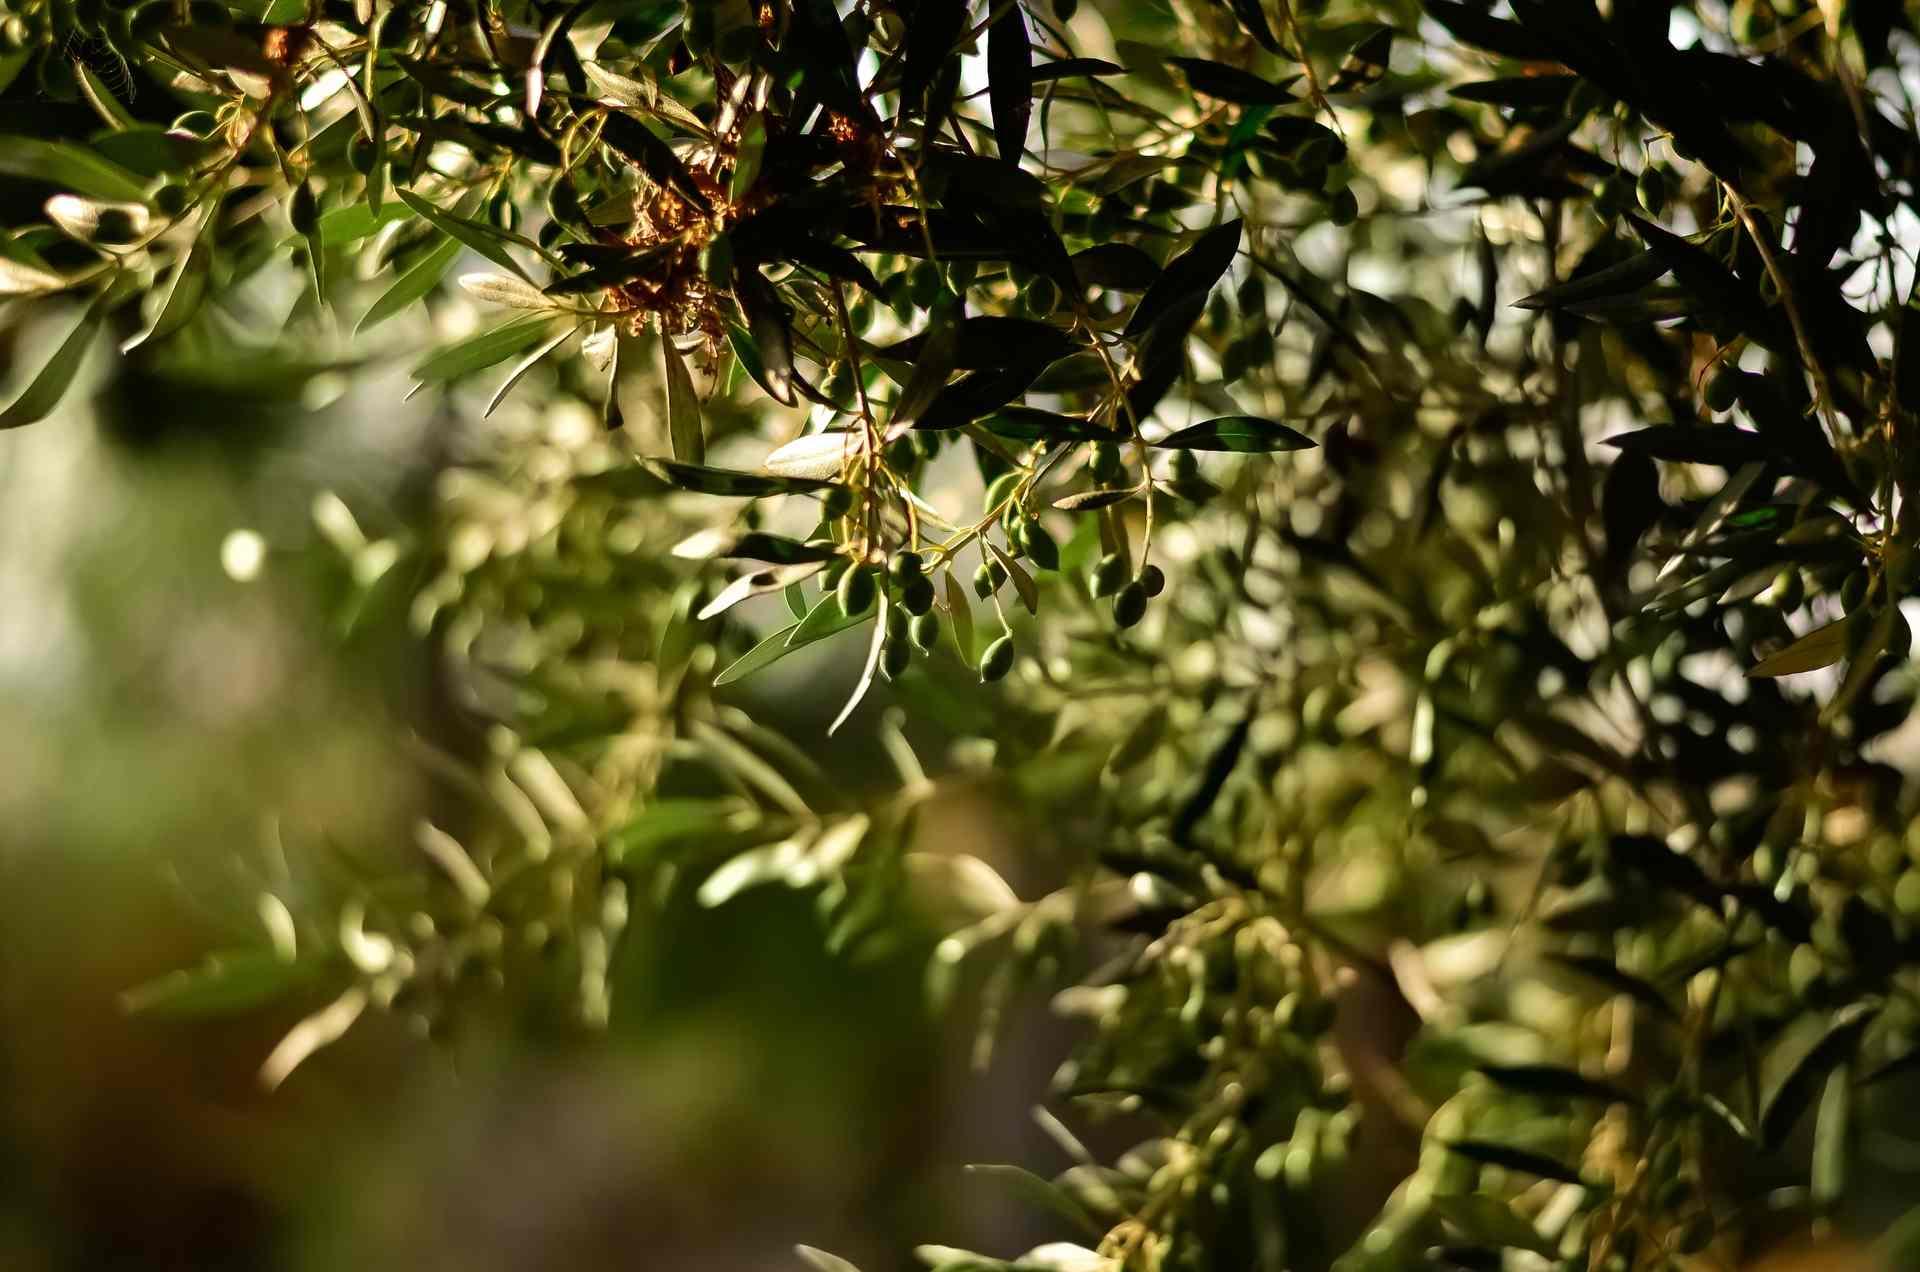 green-leaf-fruit-tree-selective-focal-photo-1047312-1 (1)